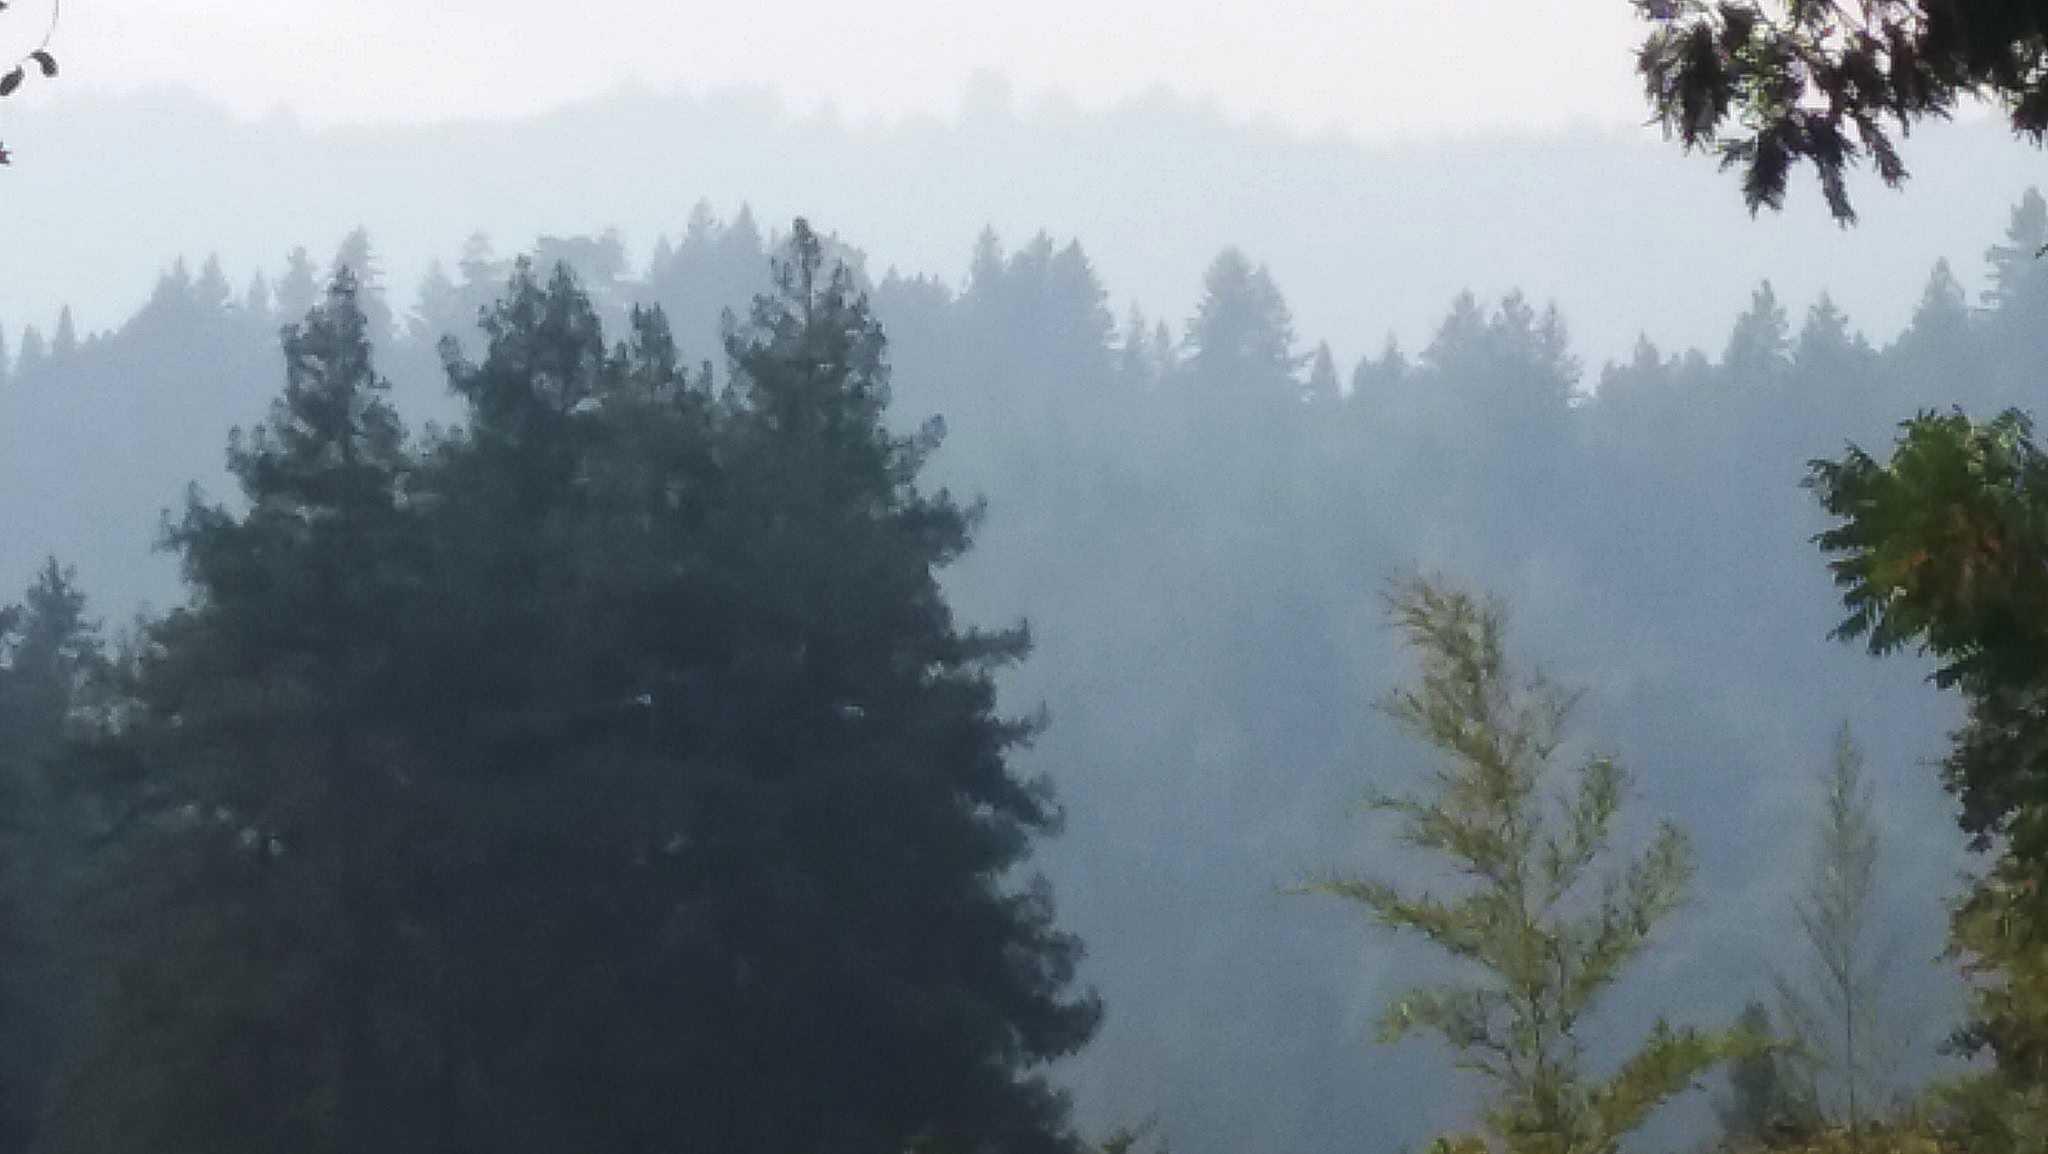 Smokey skies in Santa Cruz mountains